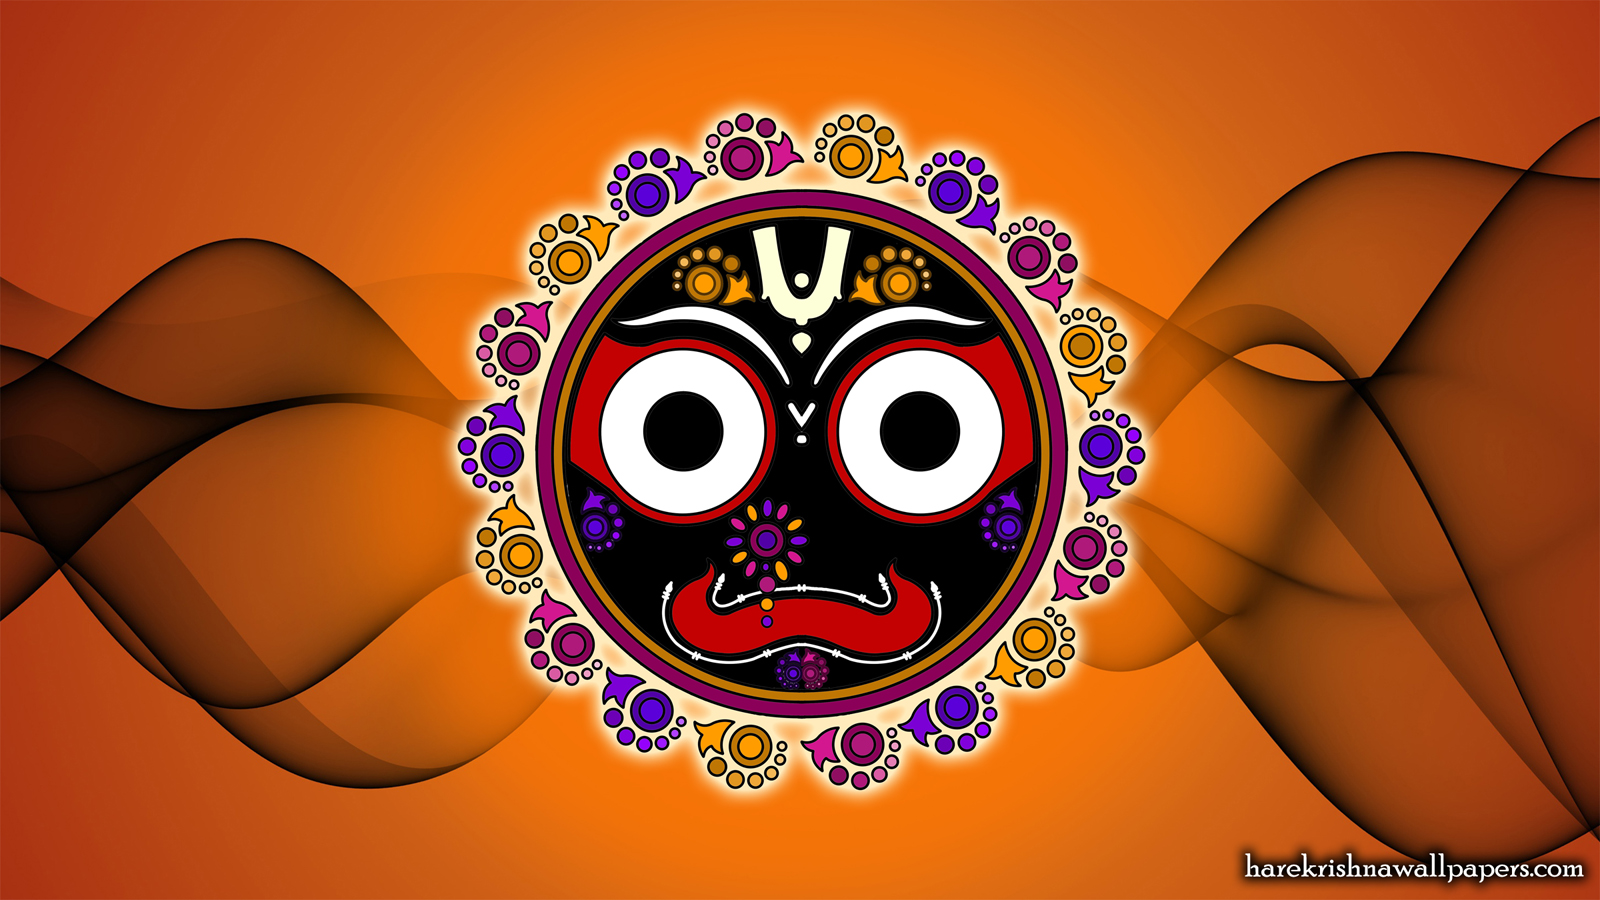 Jai Jagannath Wallpaper (043) Size 1600x900 Download